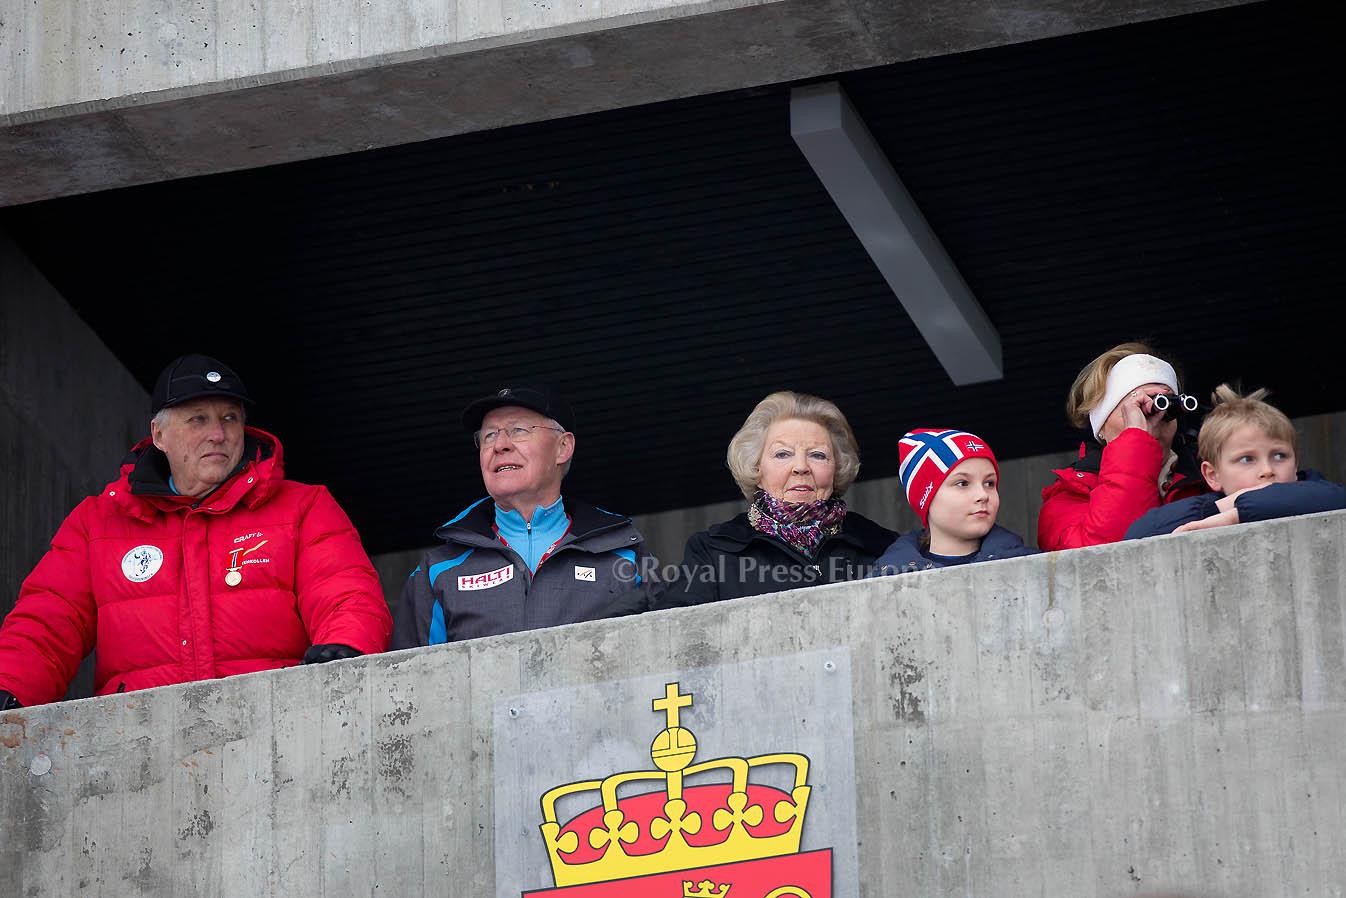 Princess Beatrix joins Norwegian King Harald, Queen Sonja at Holmenkollen Ski Jump Championships